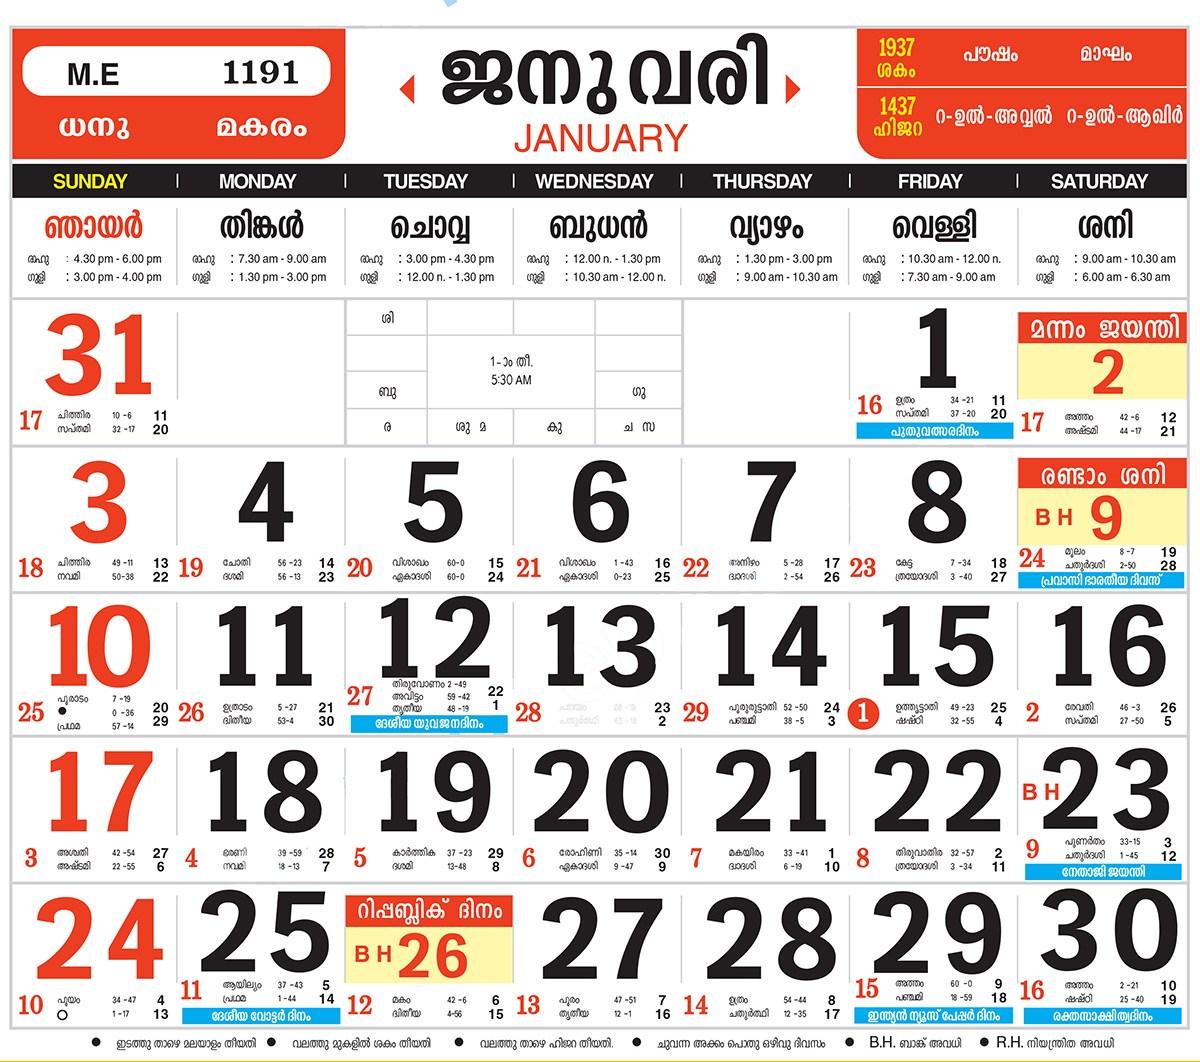 Kerala Kaumudi Malayalam Calendar 2017 | Calendar Template 2017